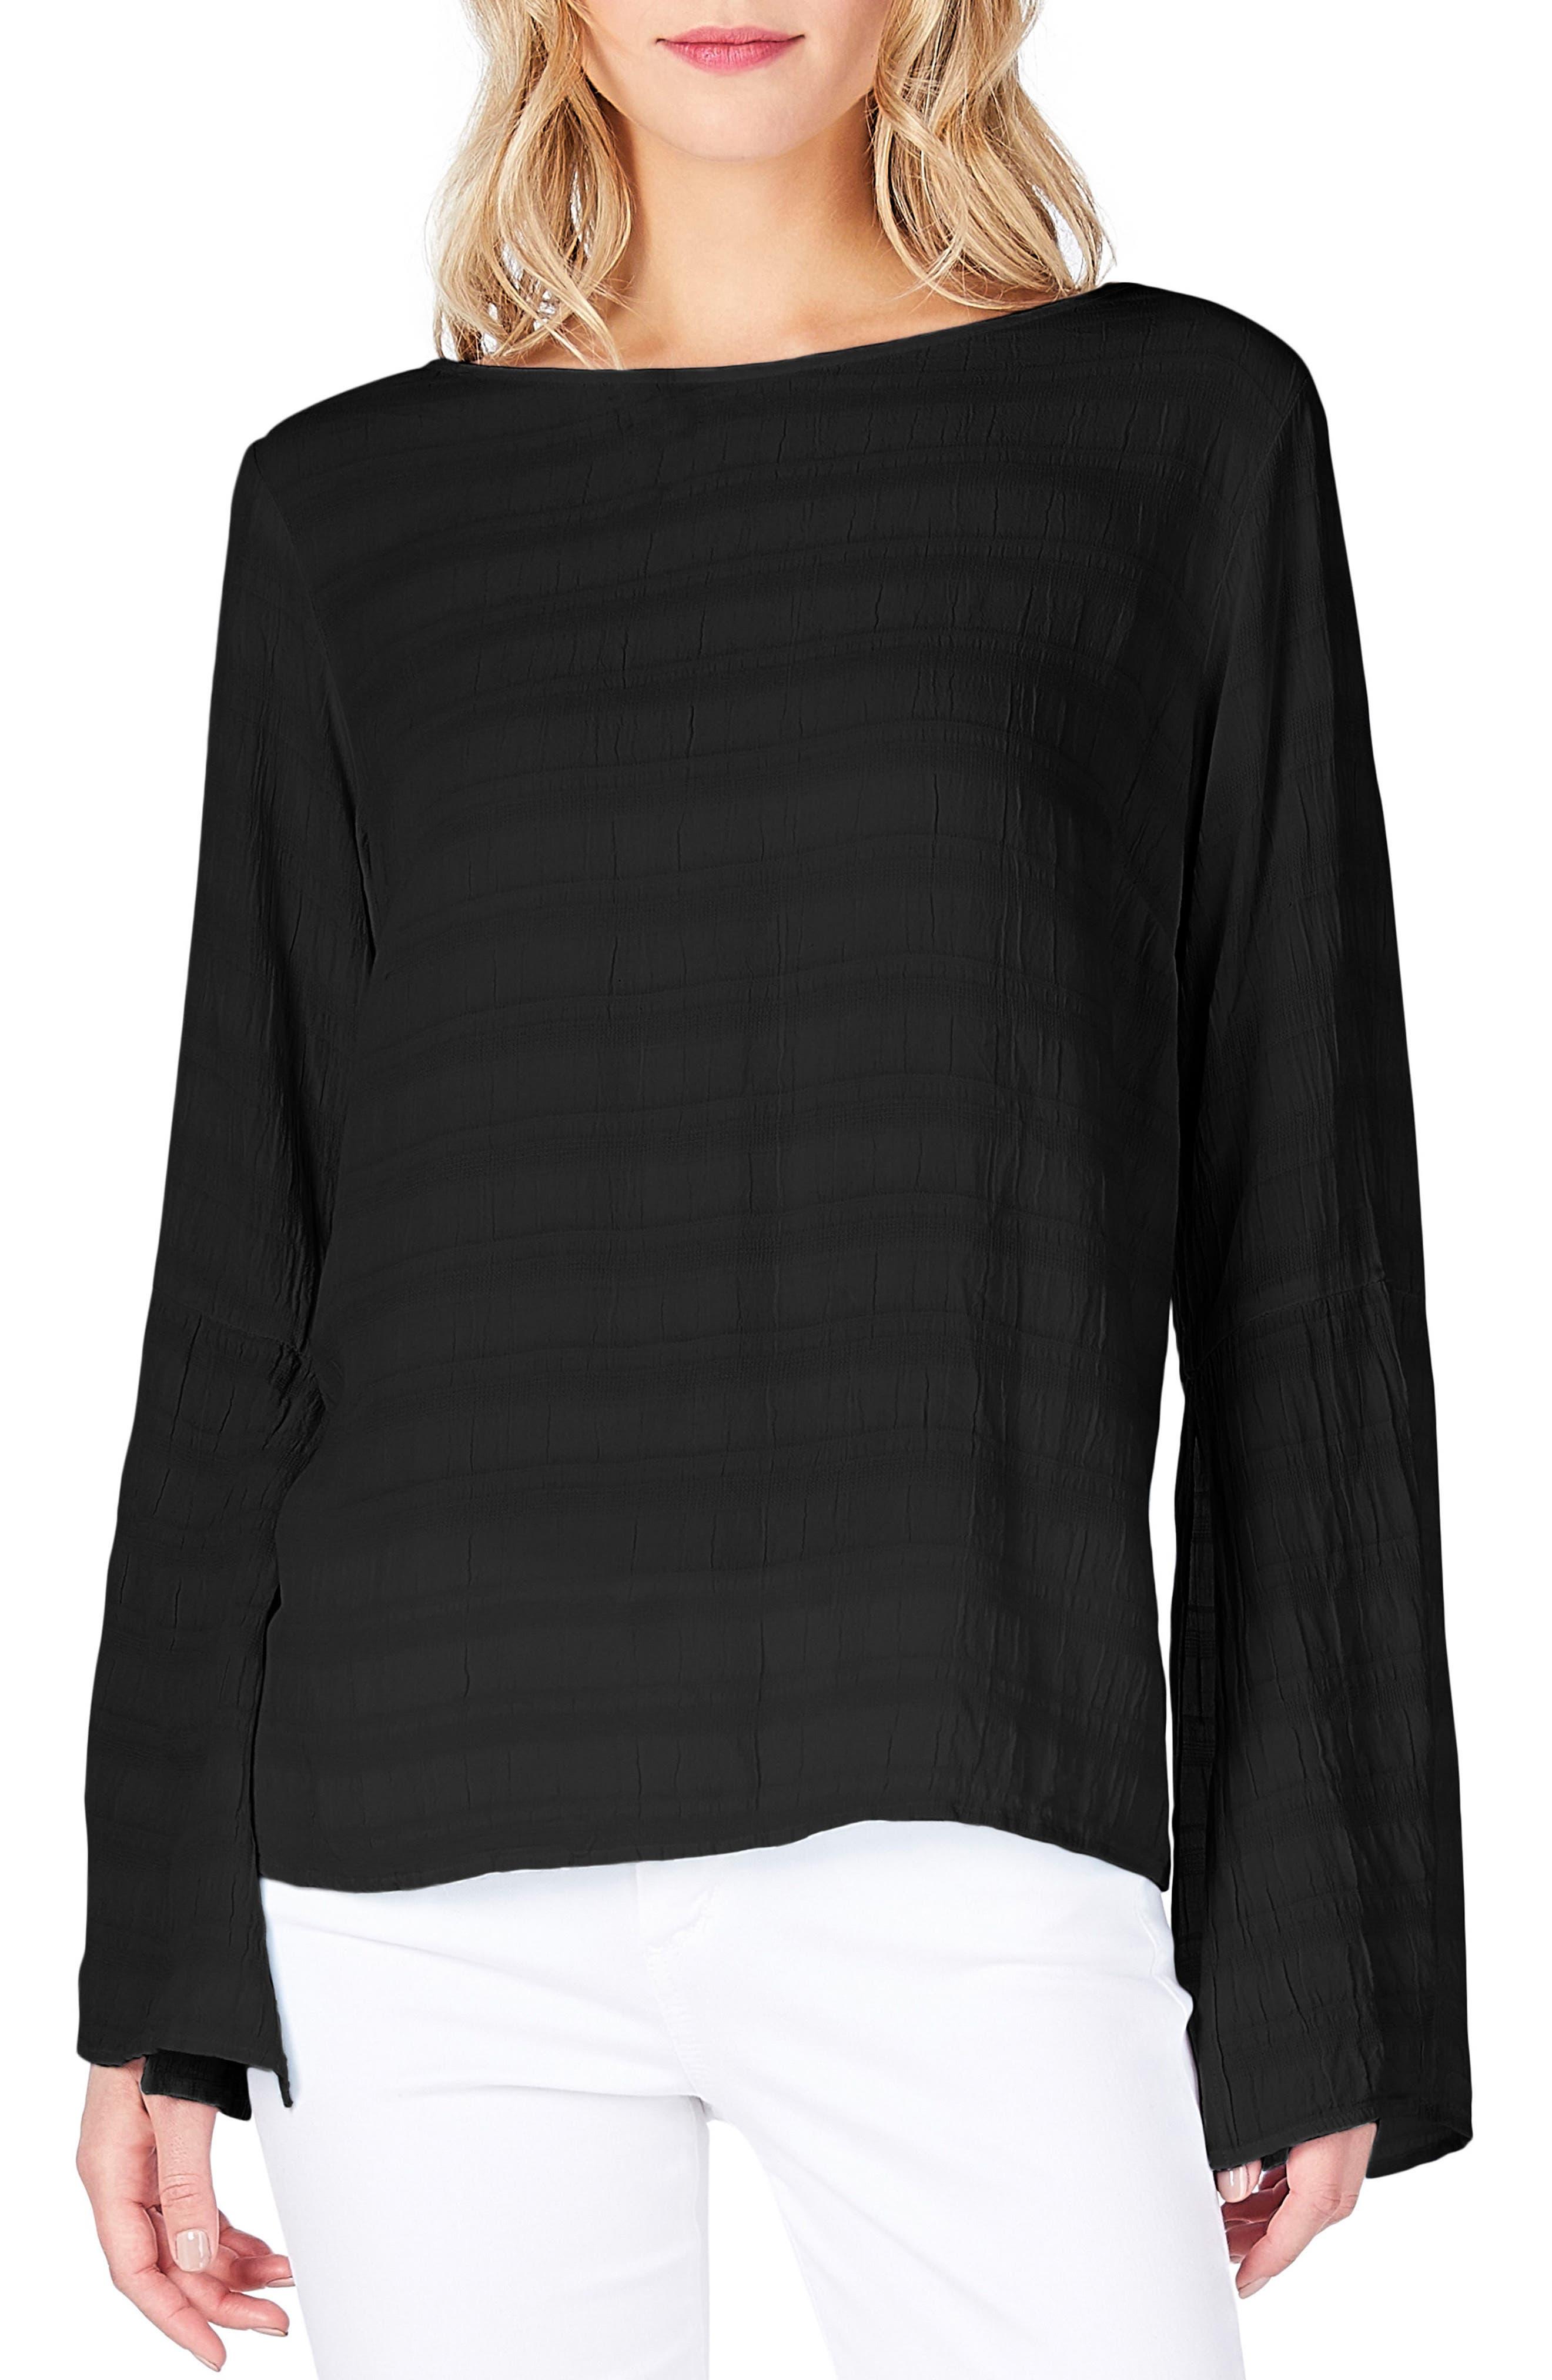 MICHAEL STARS Slit Bell Sleeve Top, Main, color, 001